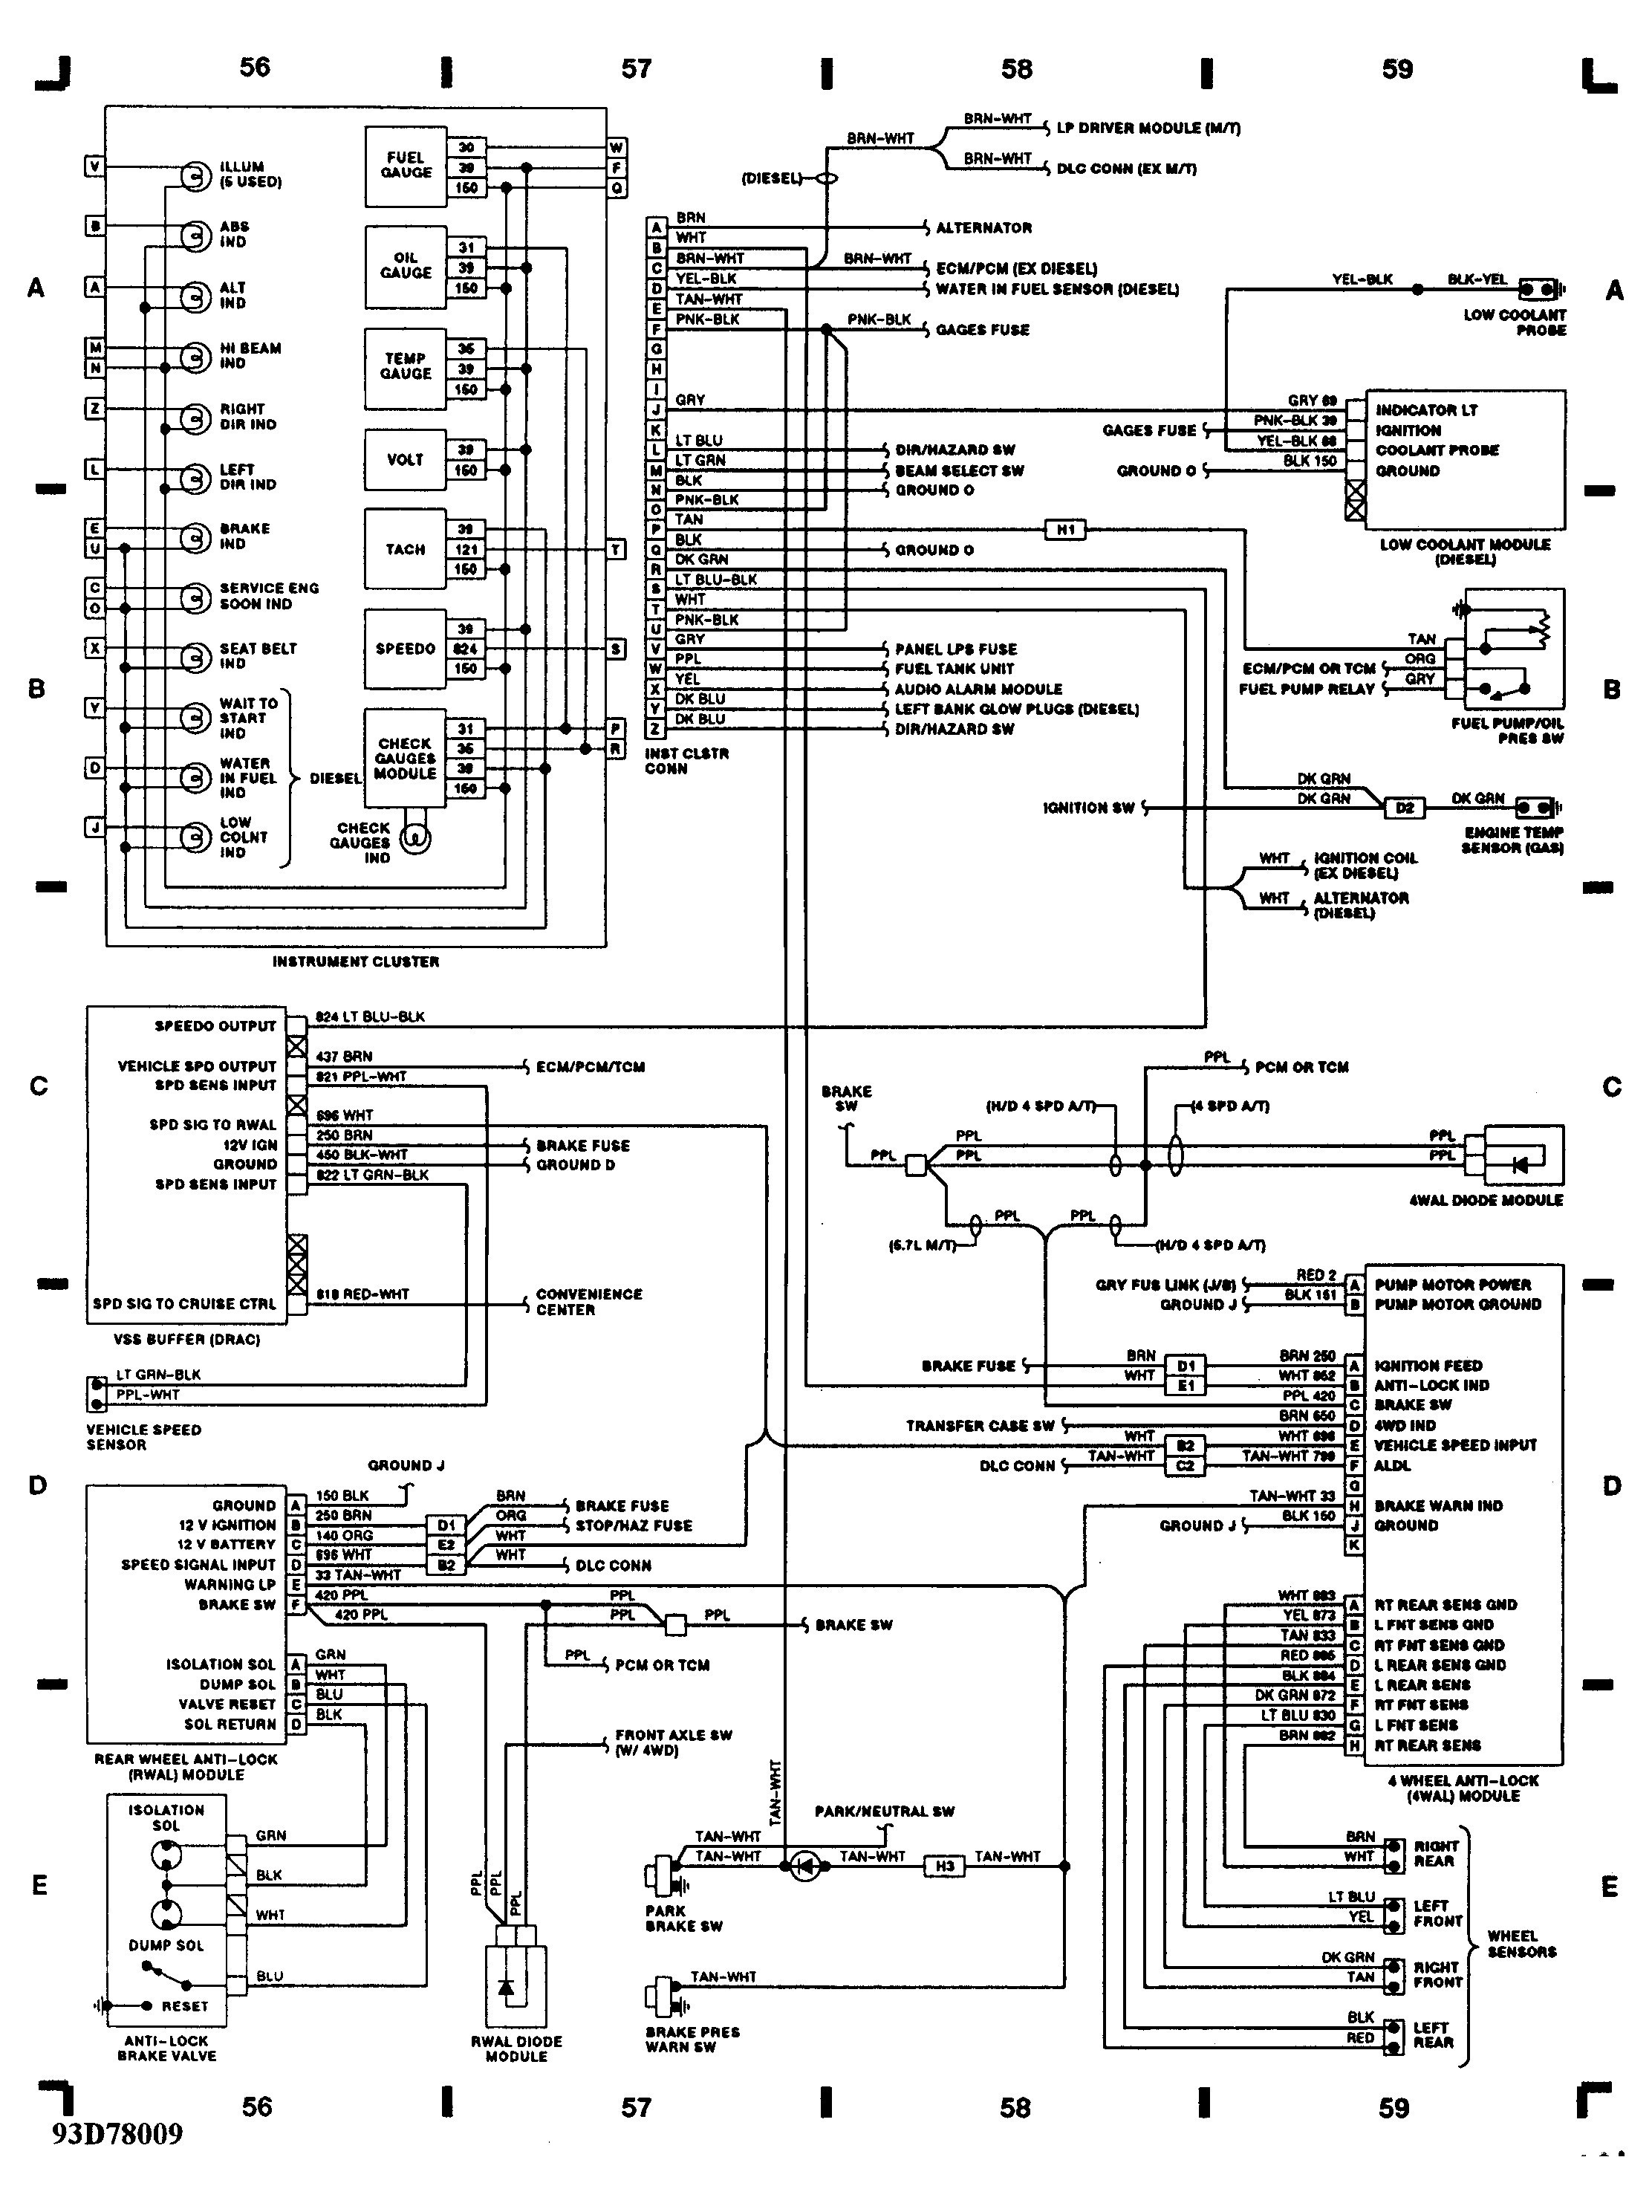 2002 toyota Sienna Engine Diagram 2002 Ls1 Engine Diagram Another Blog About Wiring Diagram • Of 2002 toyota Sienna Engine Diagram